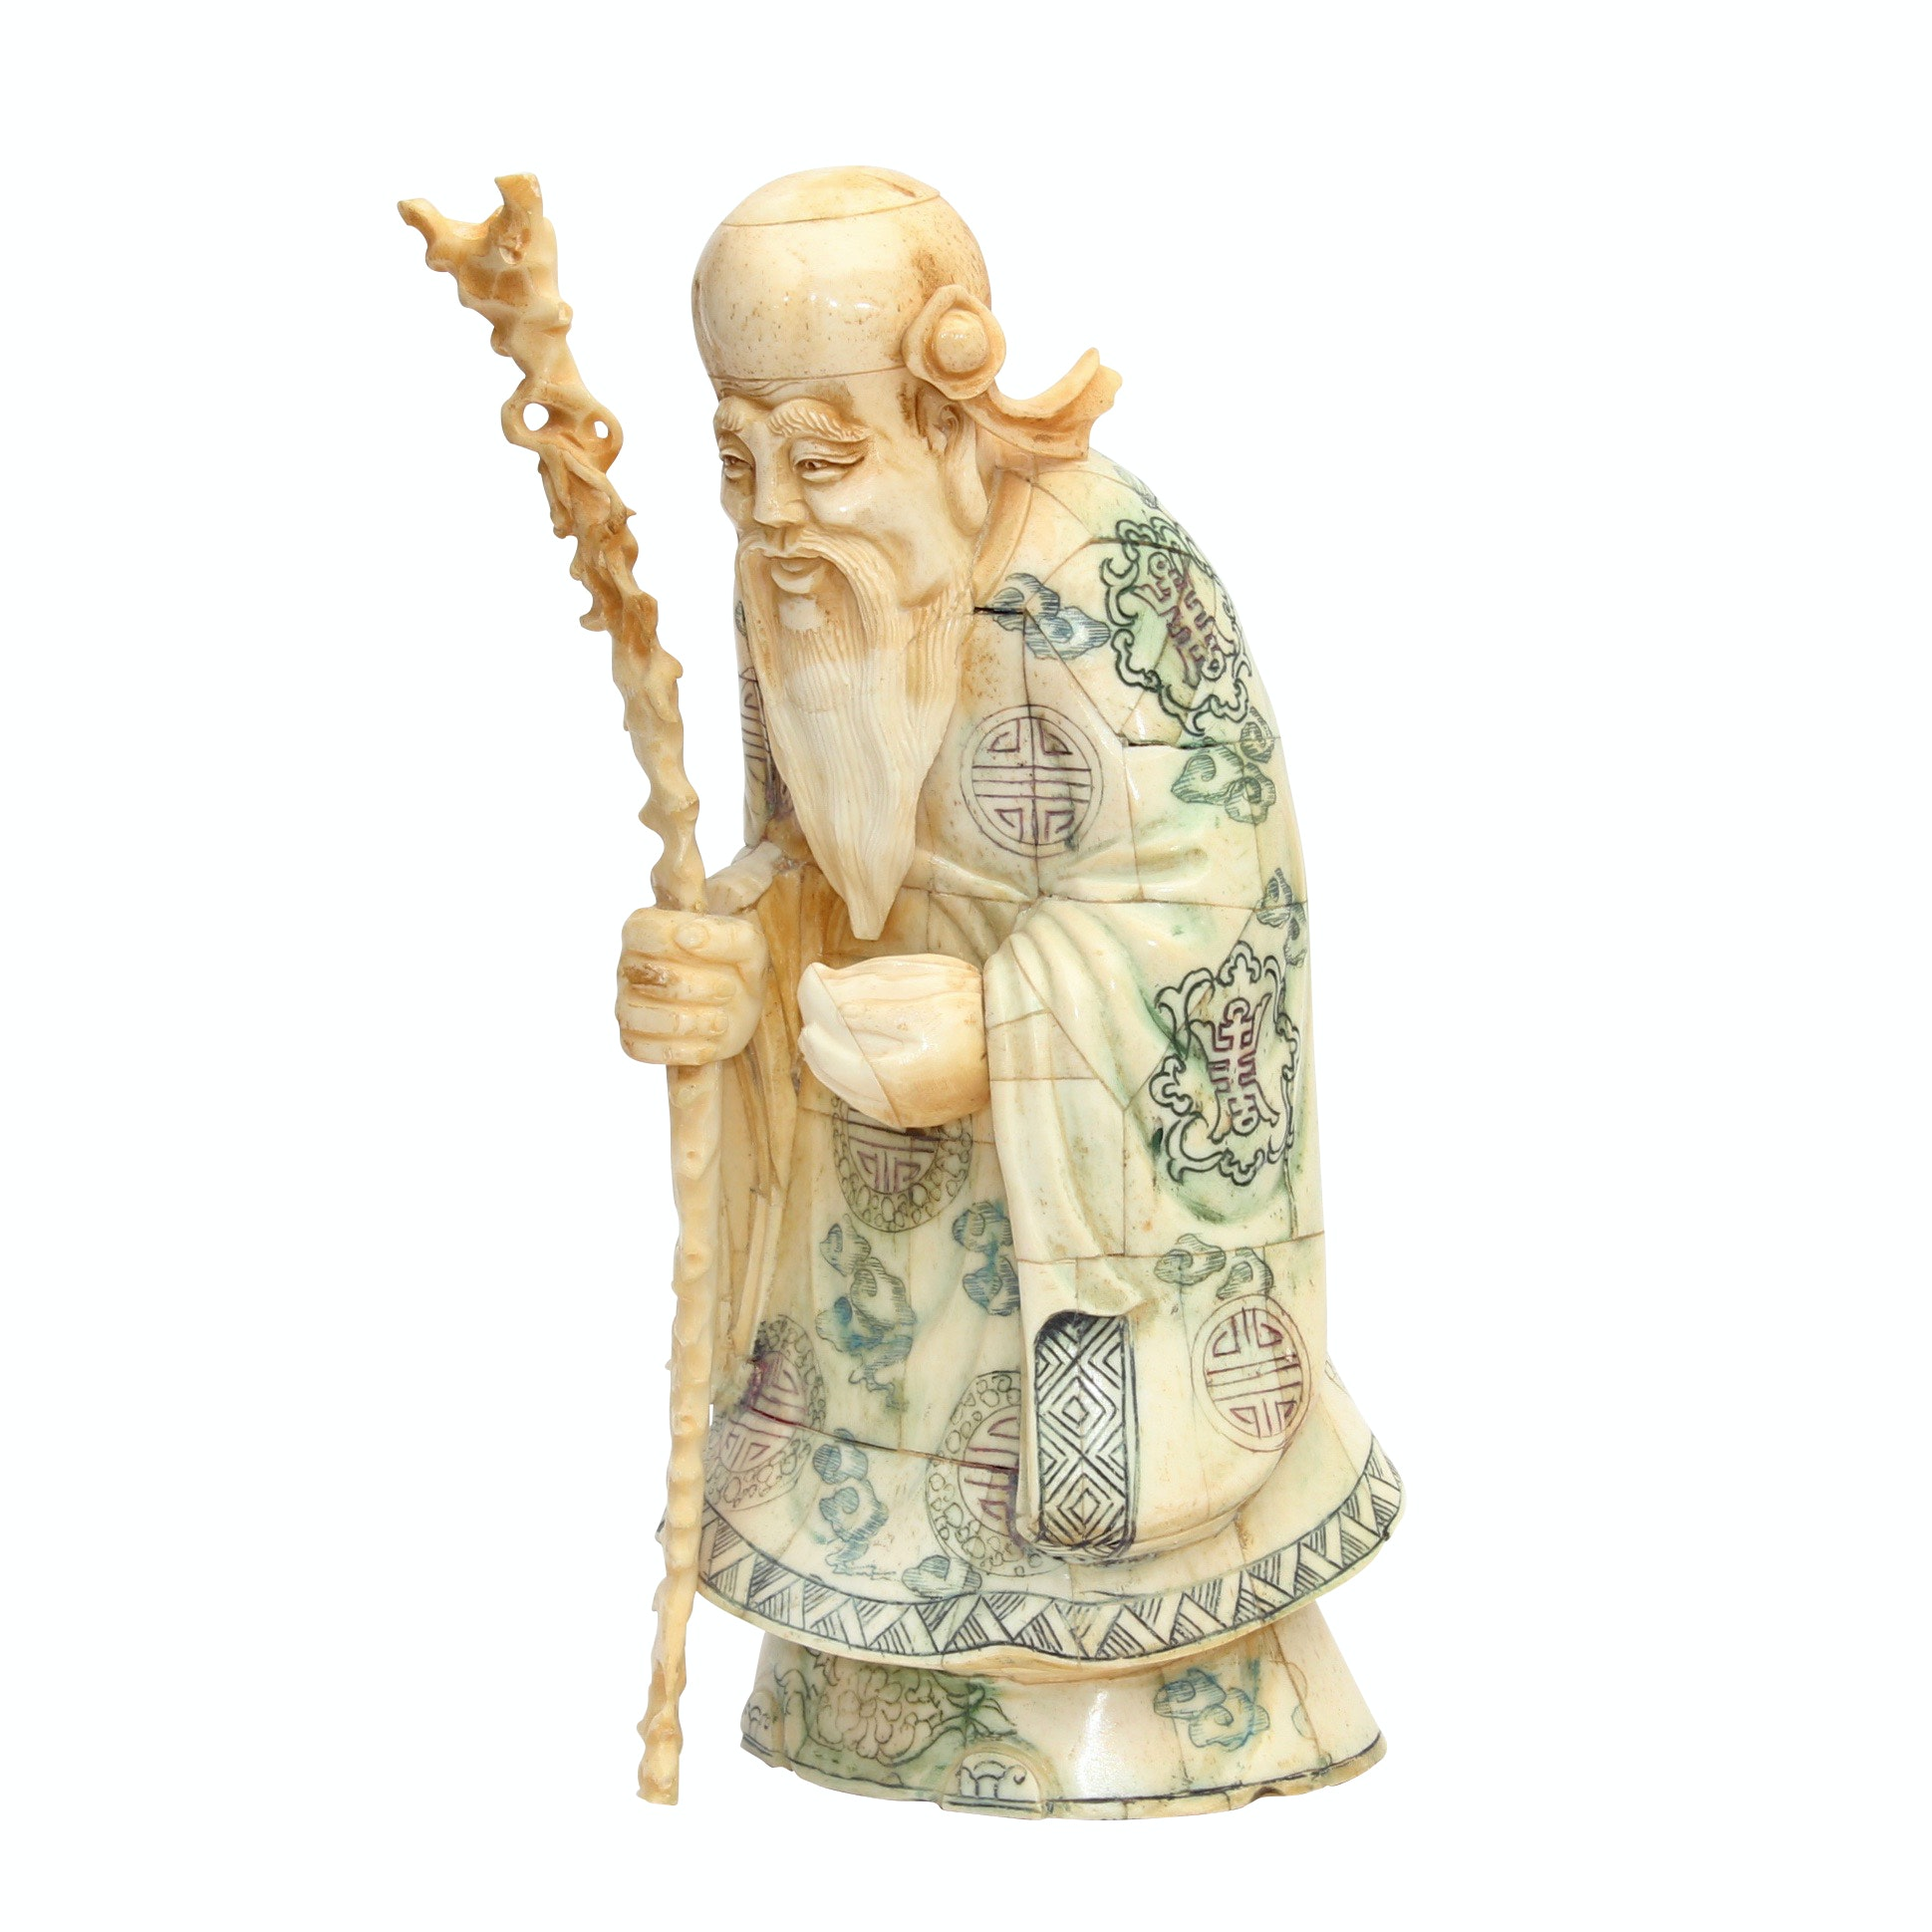 Chinese Carved Tessellated Bone God of Longevity Figurine, Late 20th Century